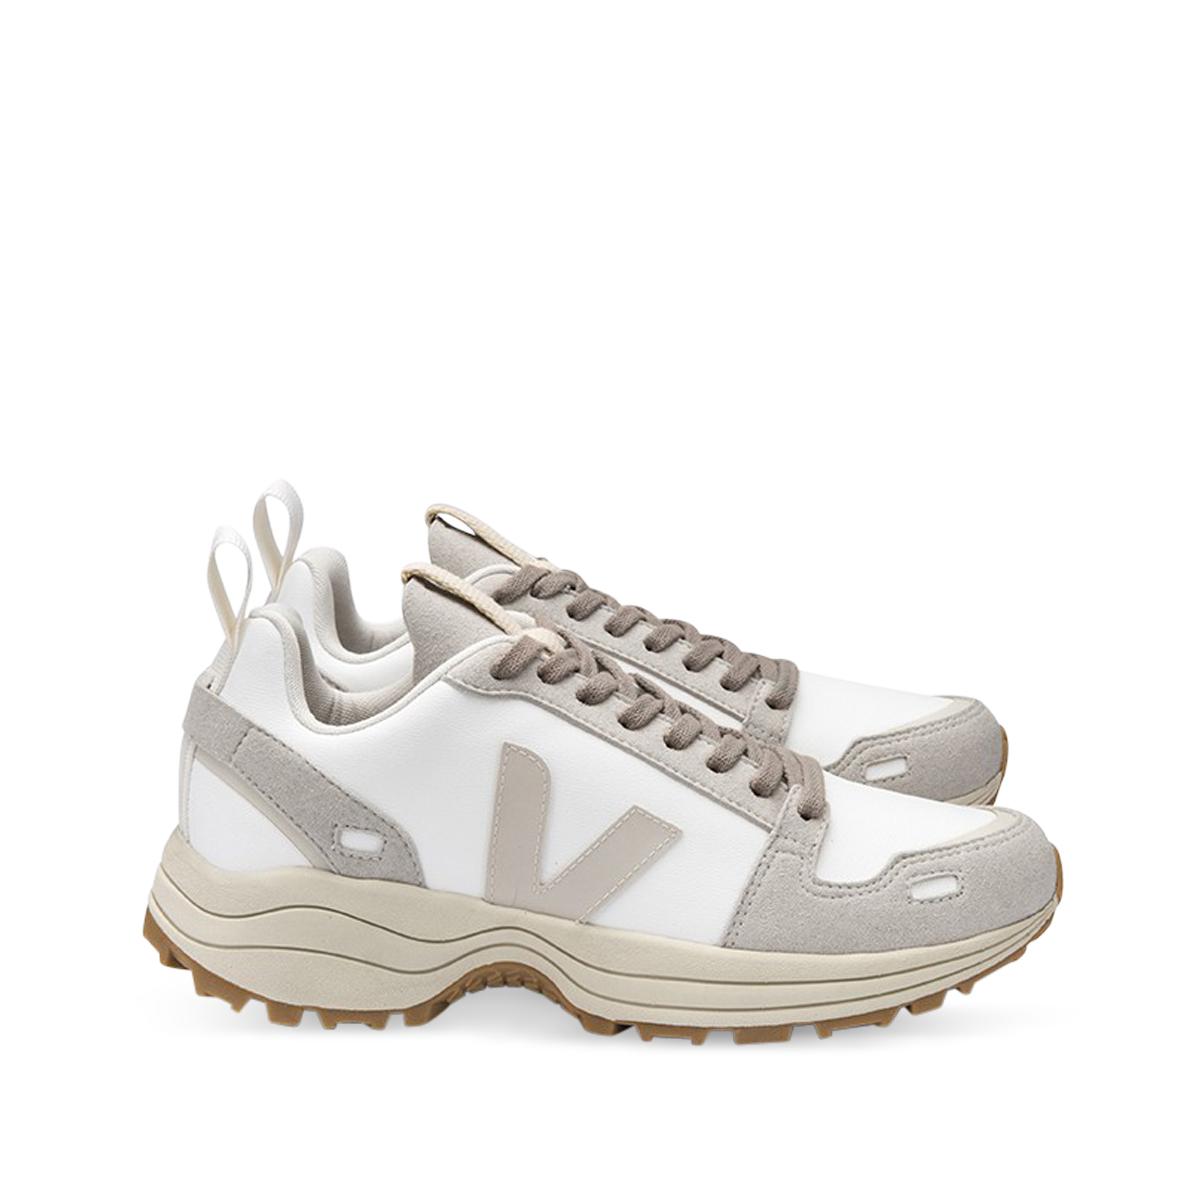 VEJA x Rick Owens Hiking Style Shoe